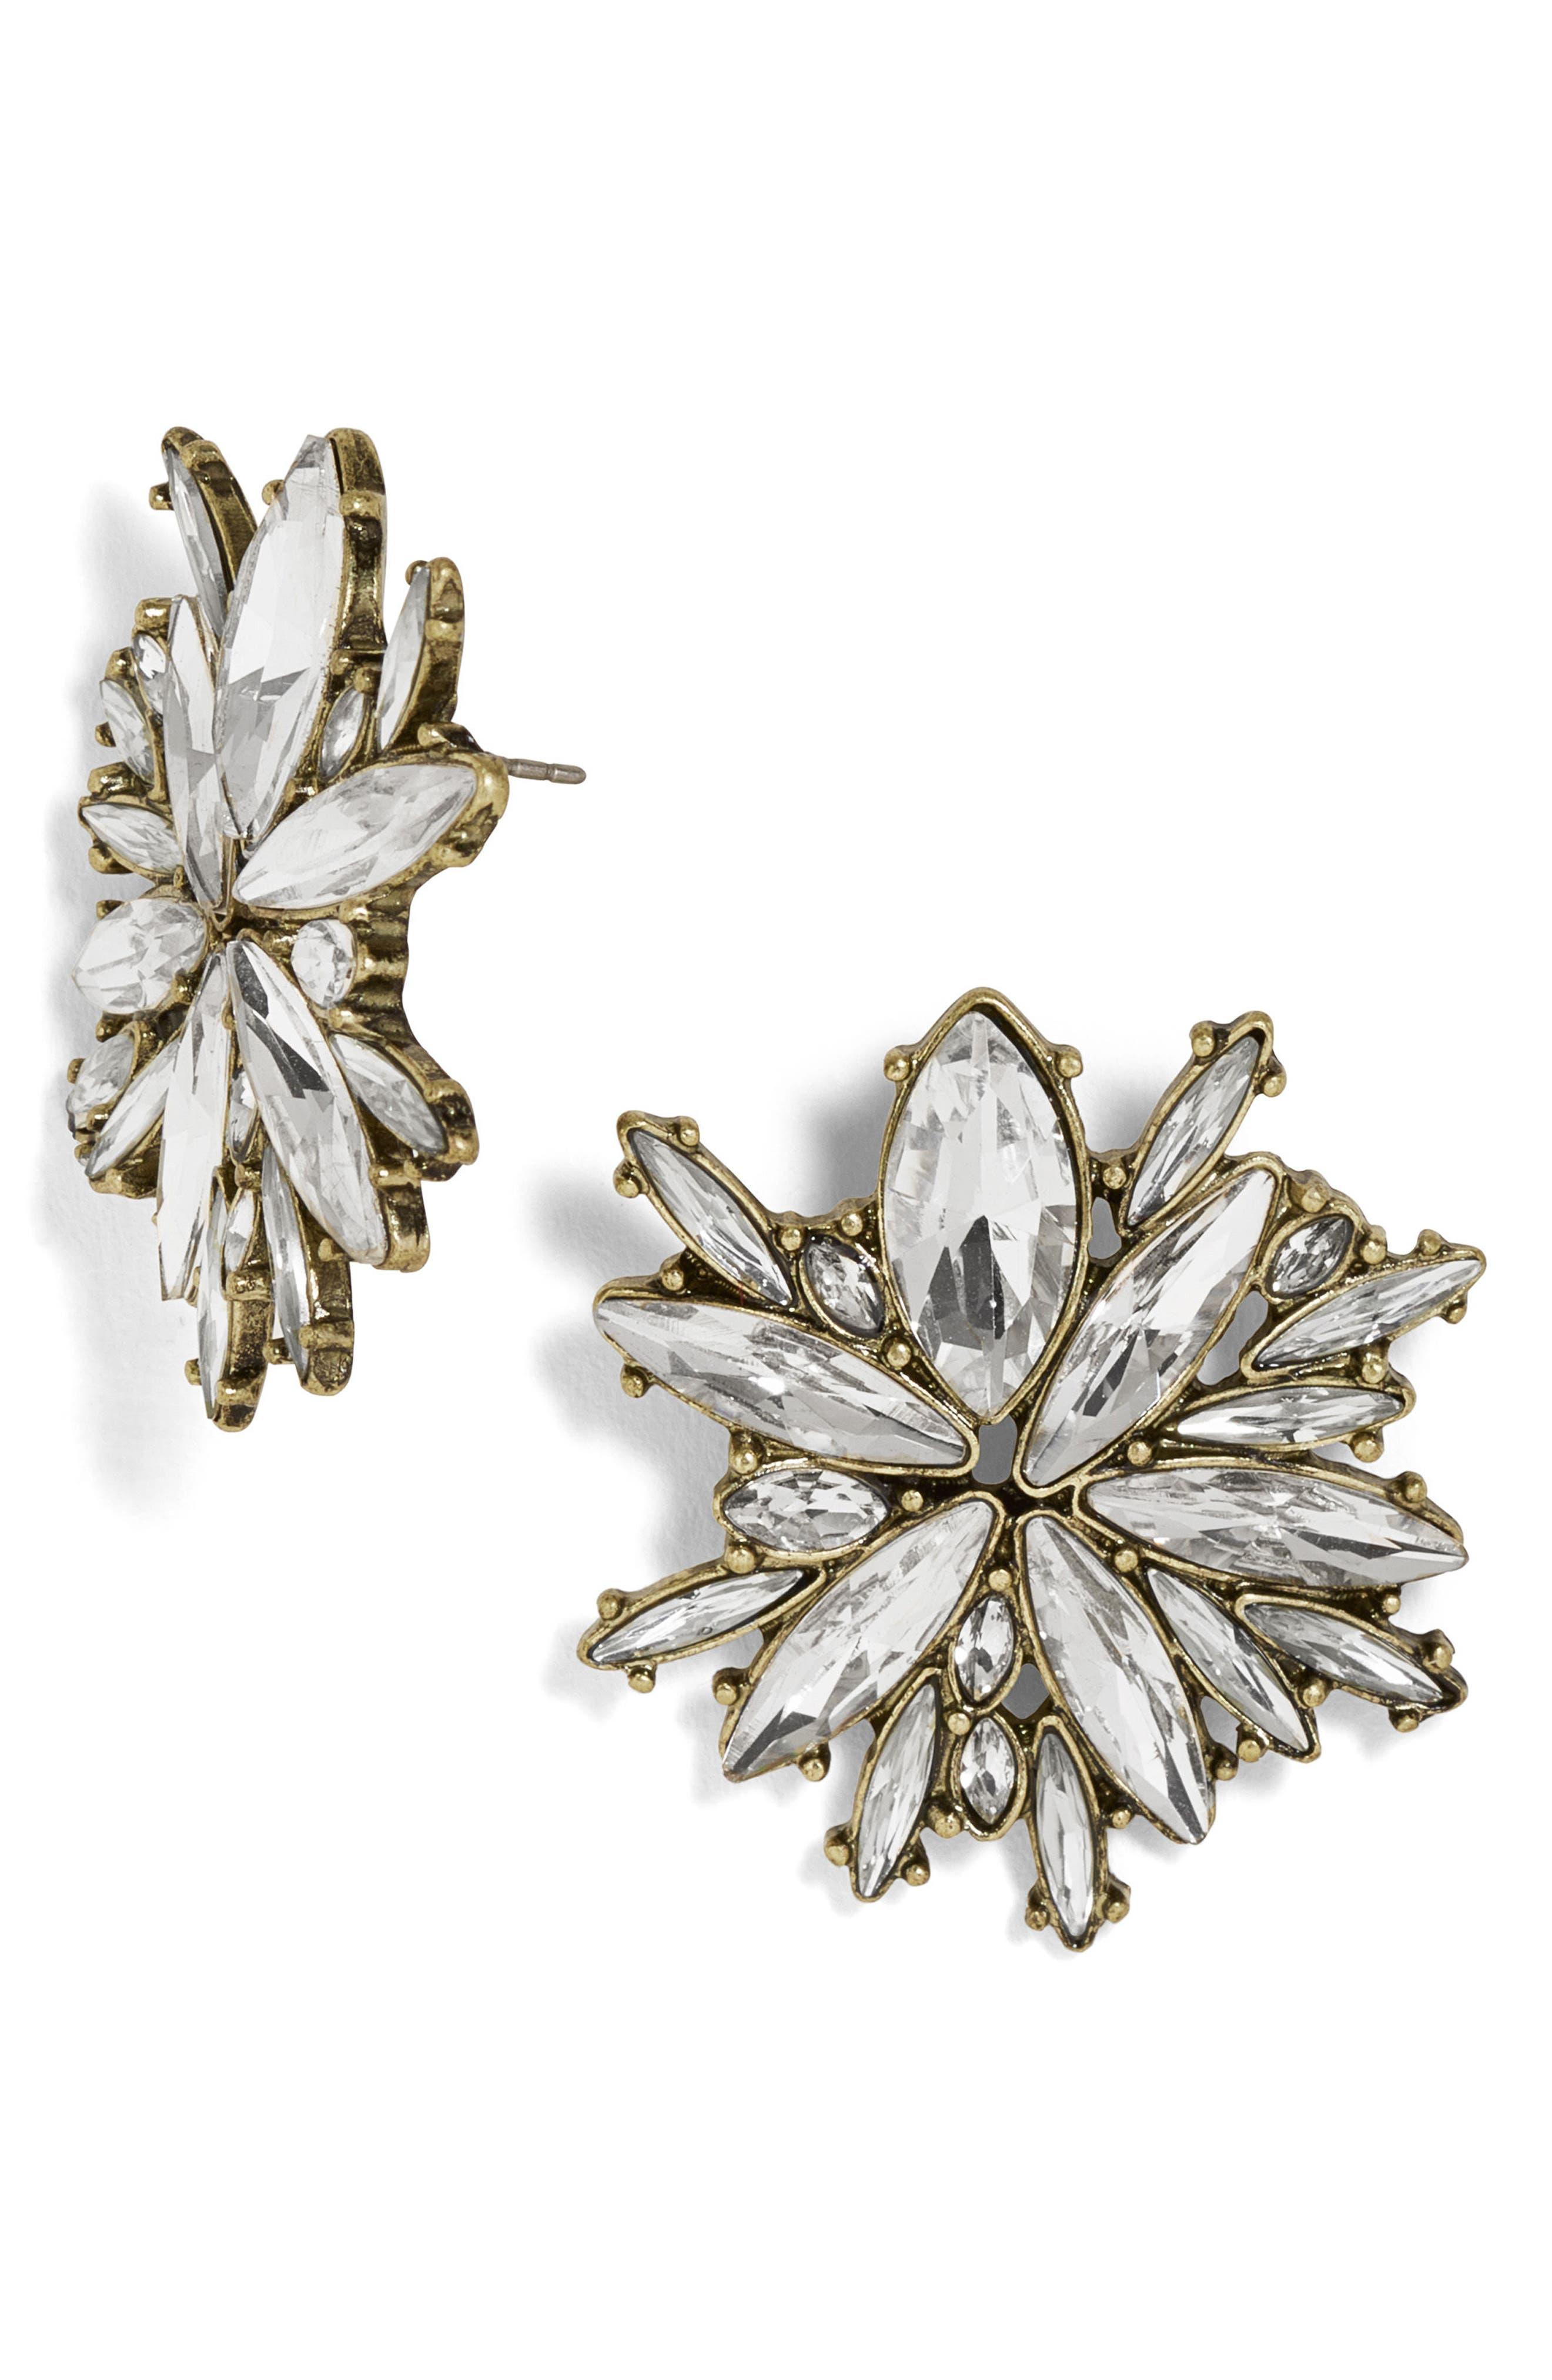 Icicle Crystal Stud Earrings,                             Main thumbnail 1, color,                             040